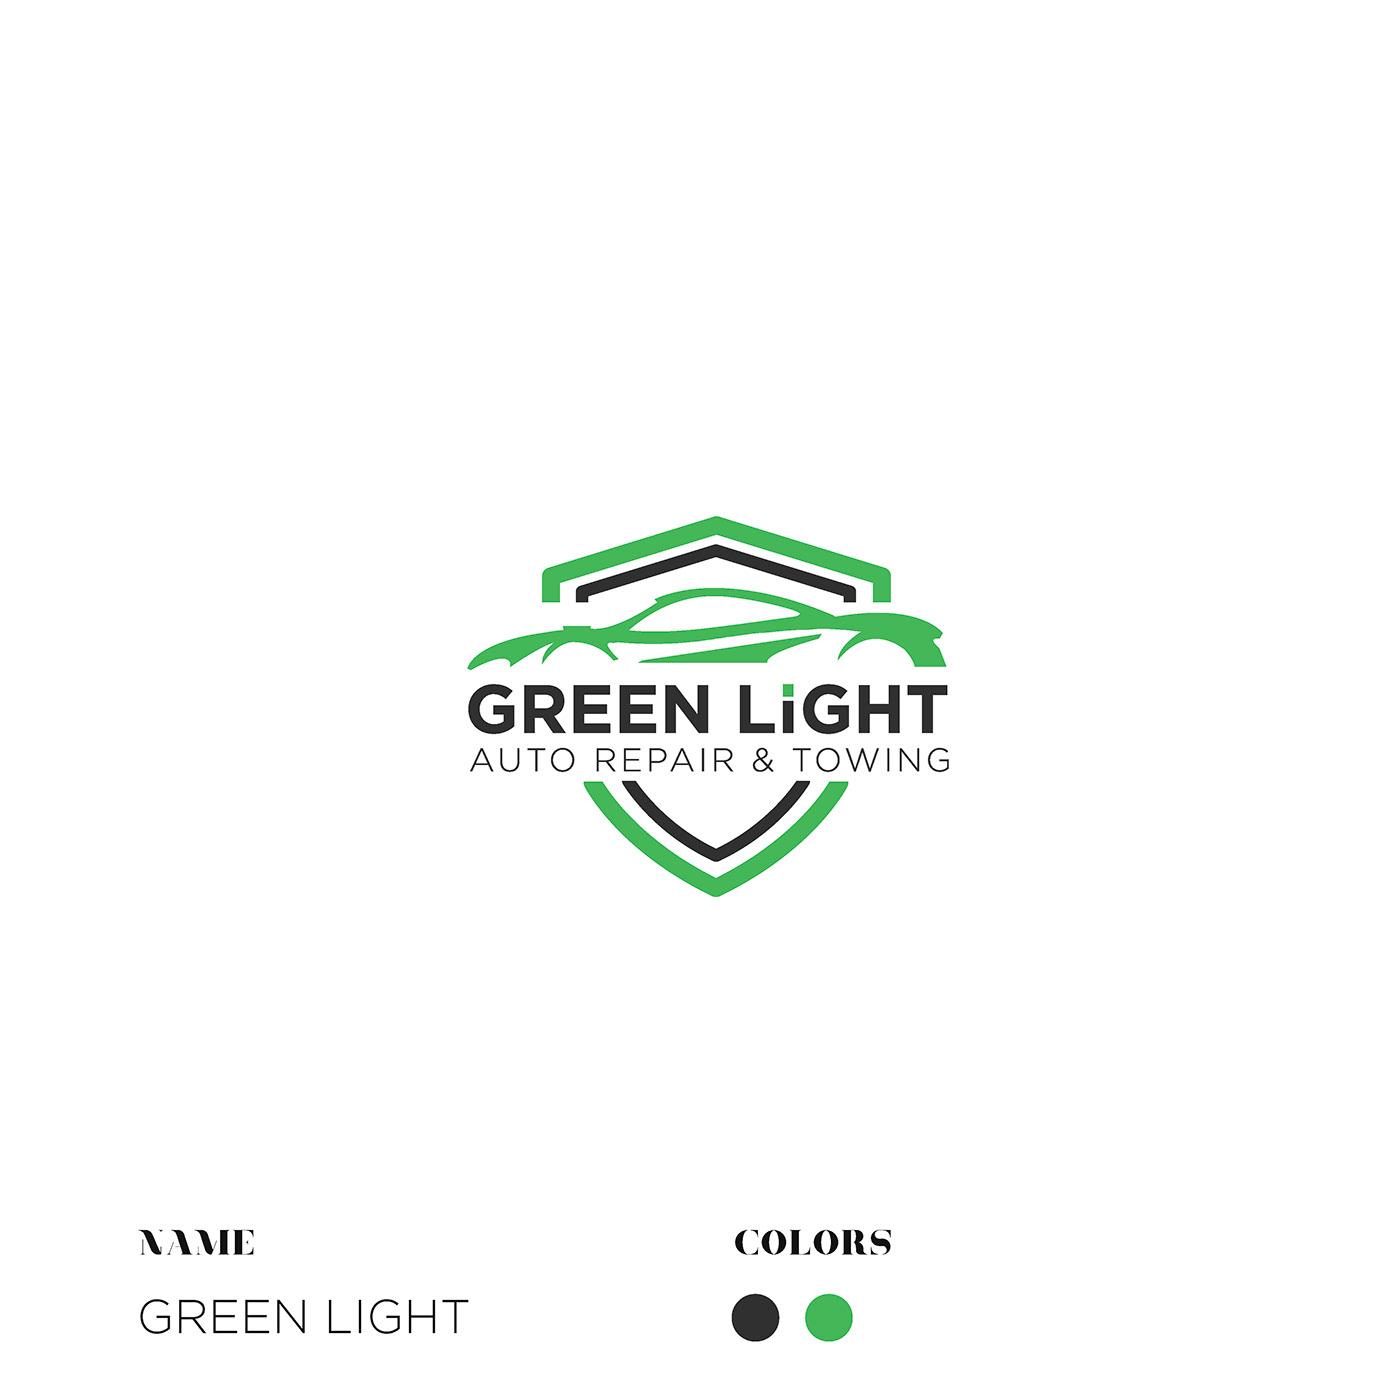 logo brand logogolio black Style minimal desgn ideas car science